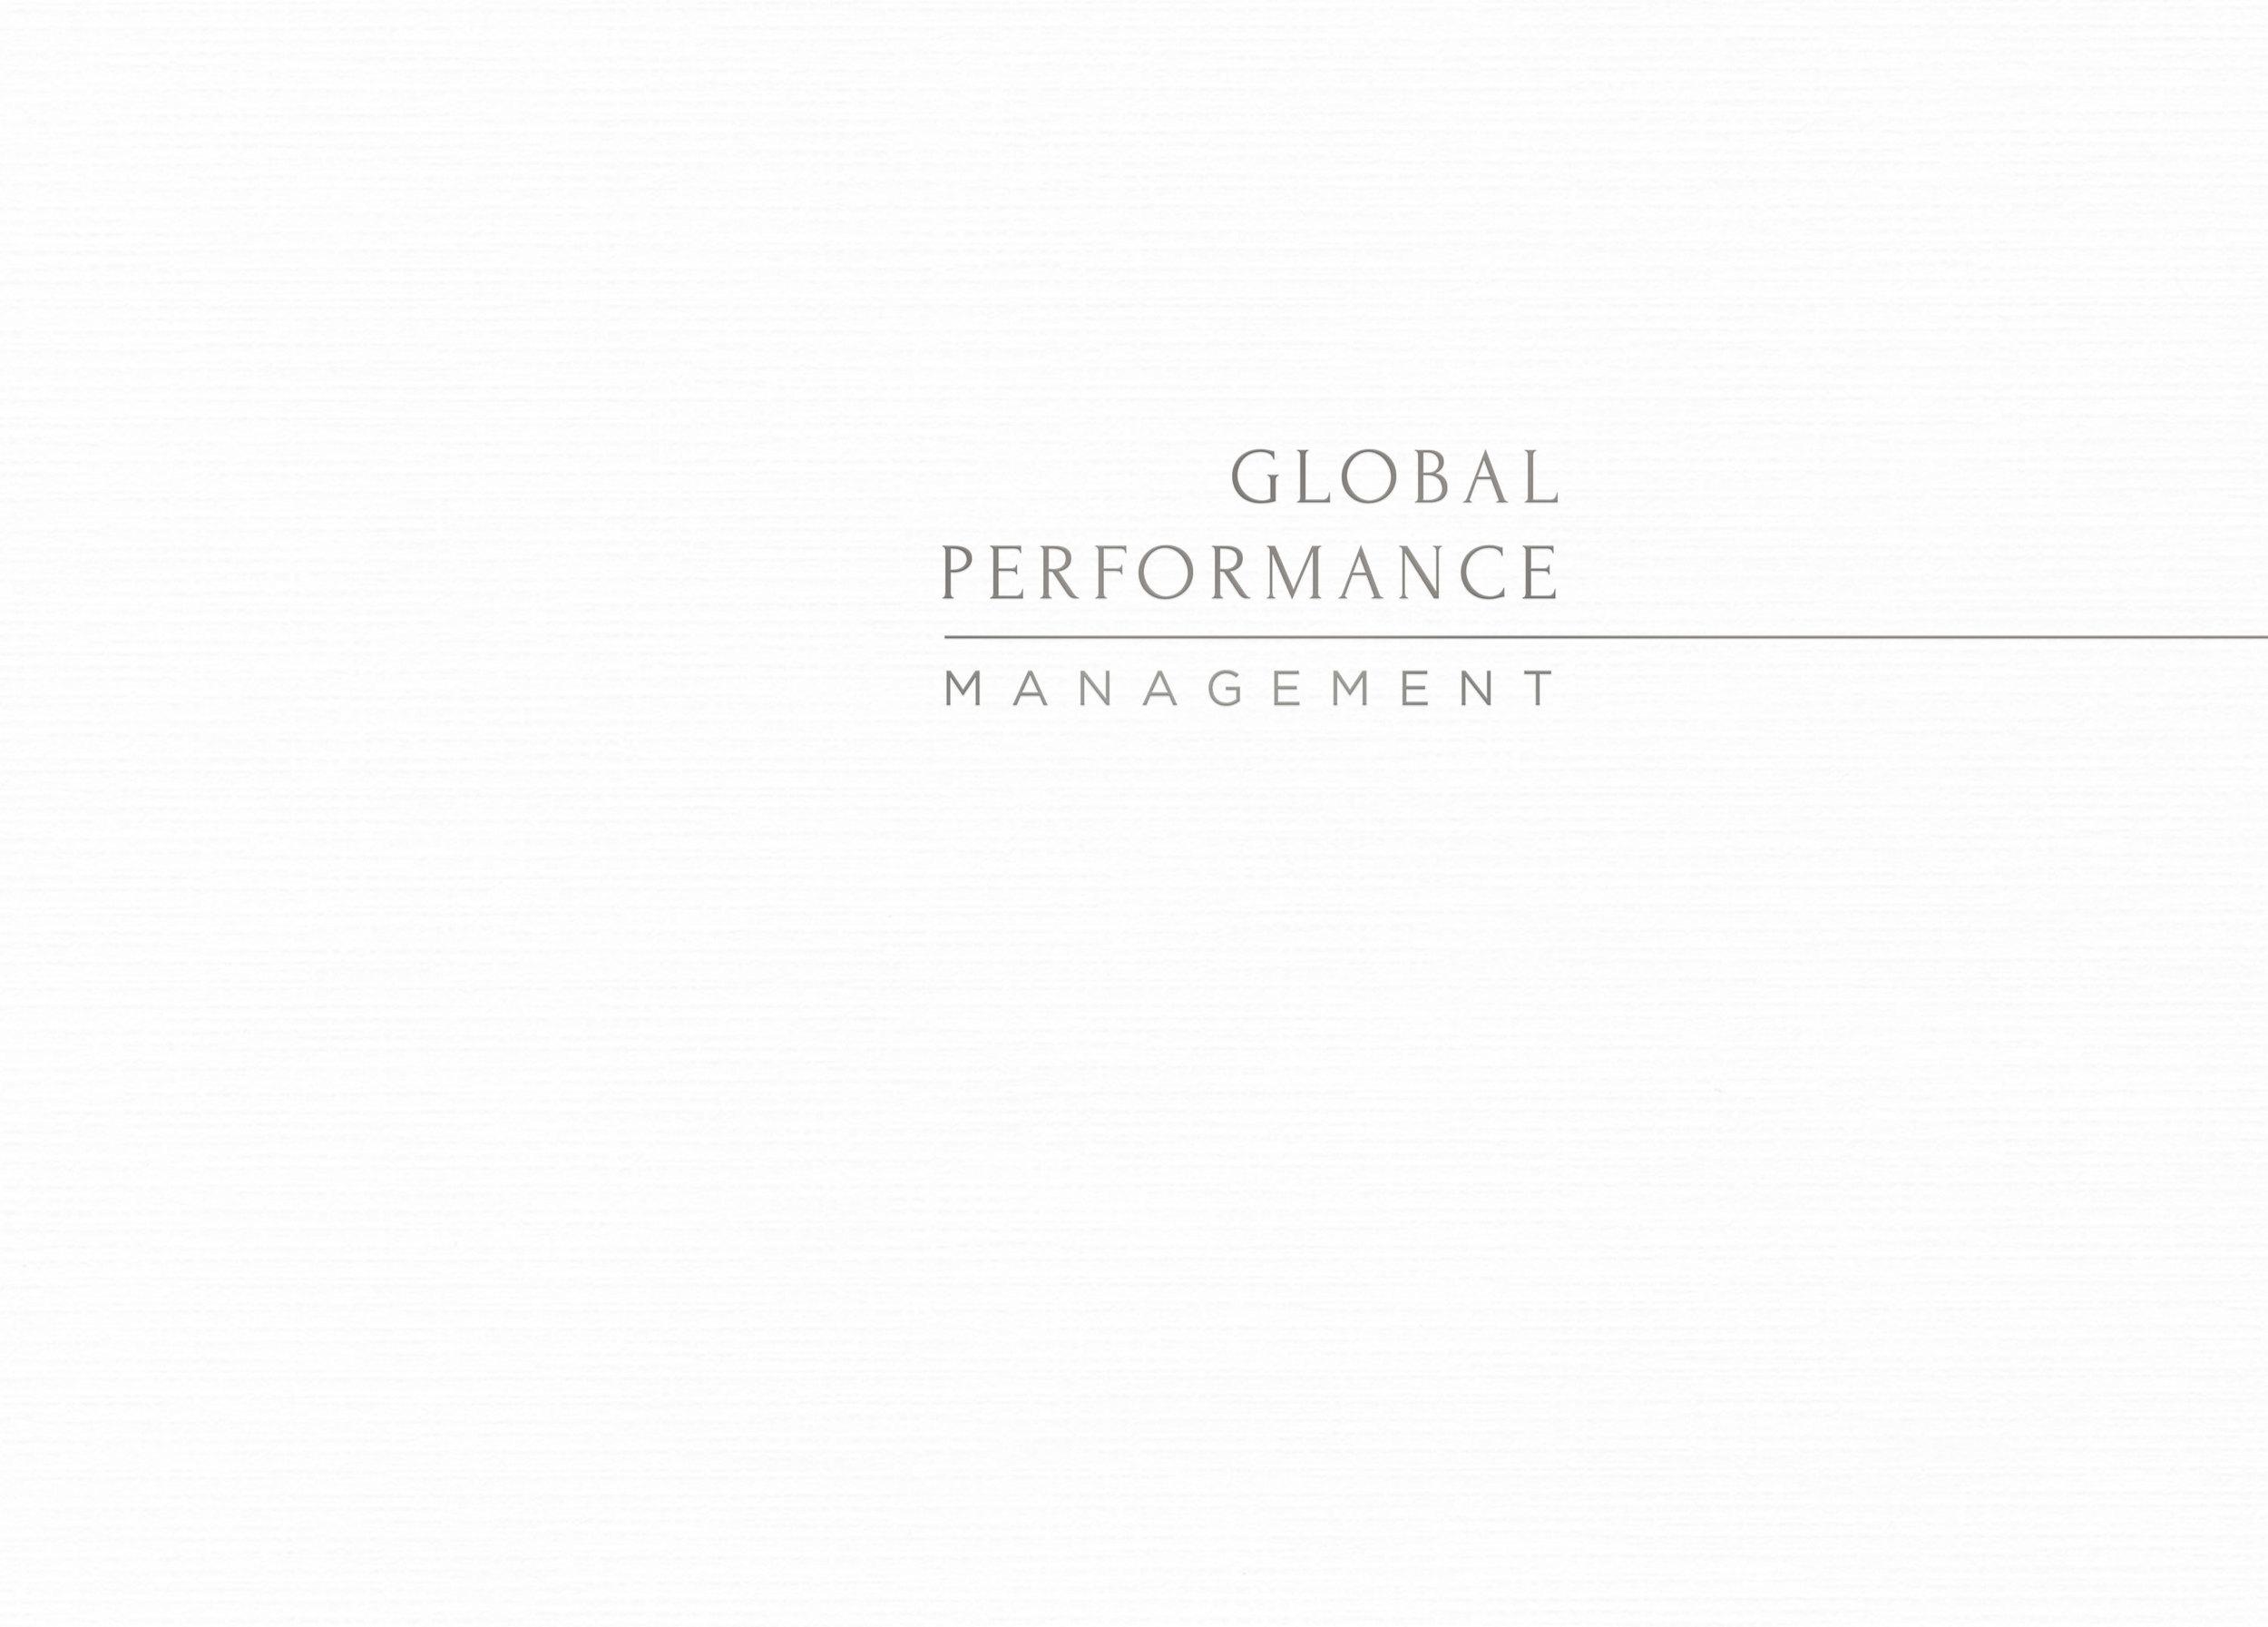 SCC2015globalperformancemanagement-2.jpg